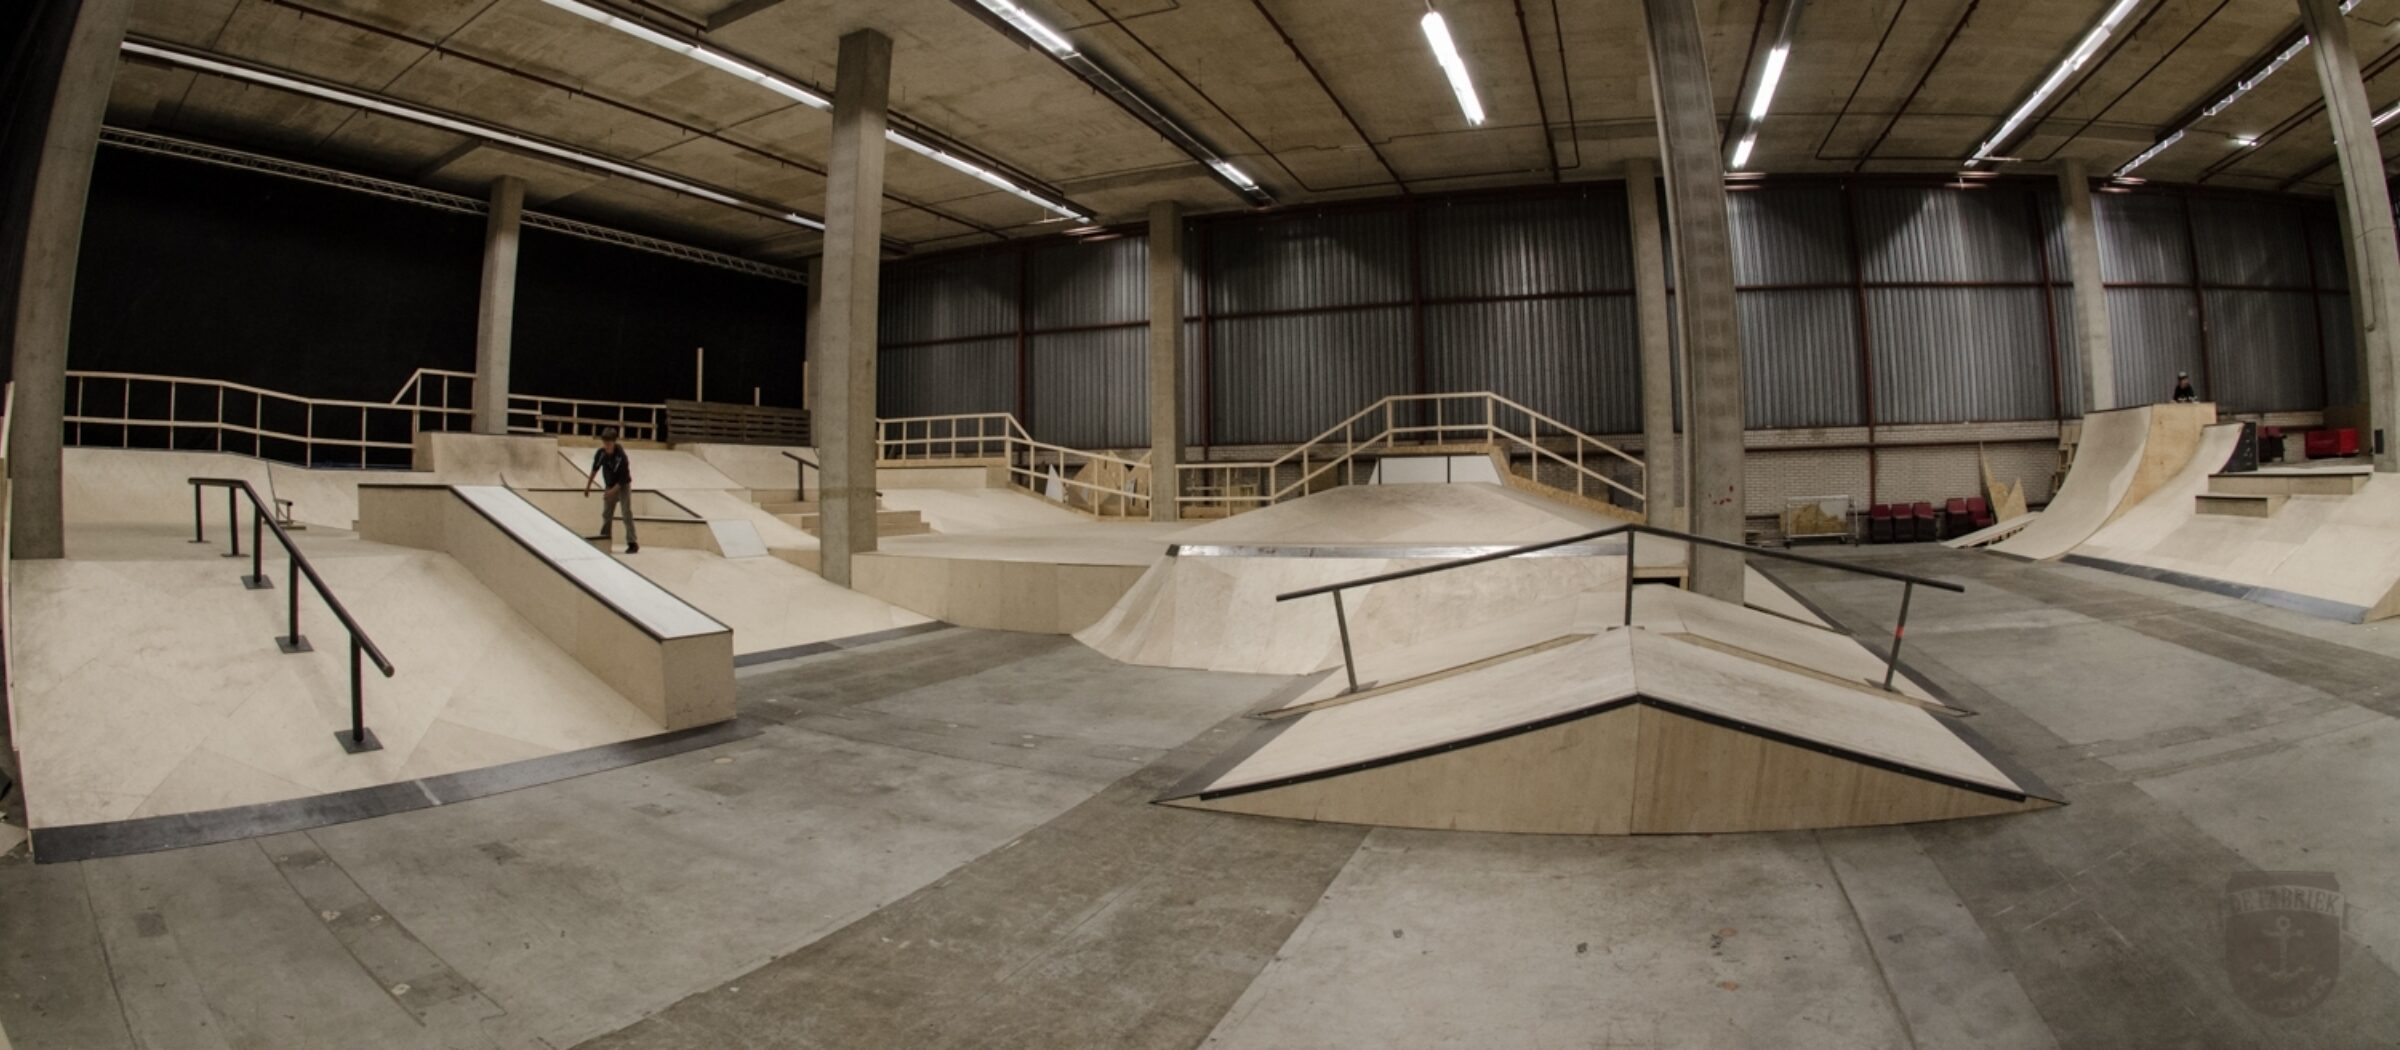 de fabriek skatepark enschede